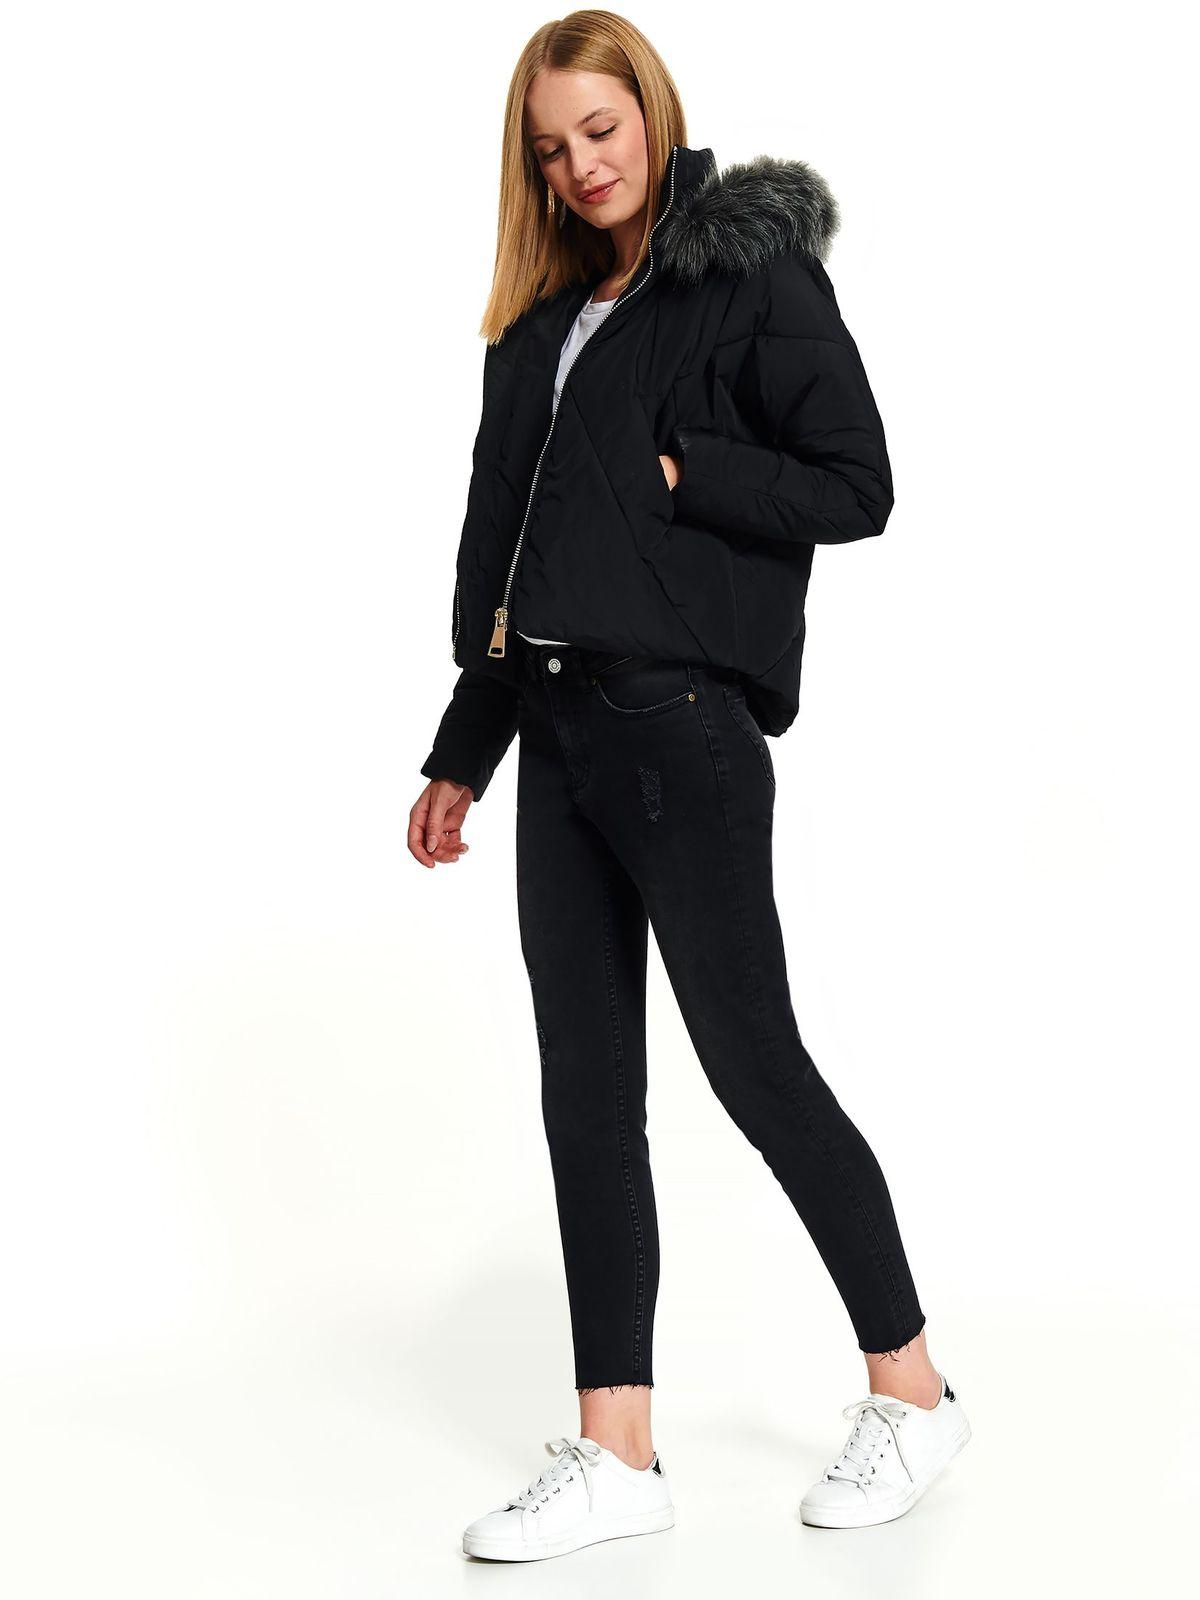 Black jacket casual short cut from slicker the jacket has hood and pockets